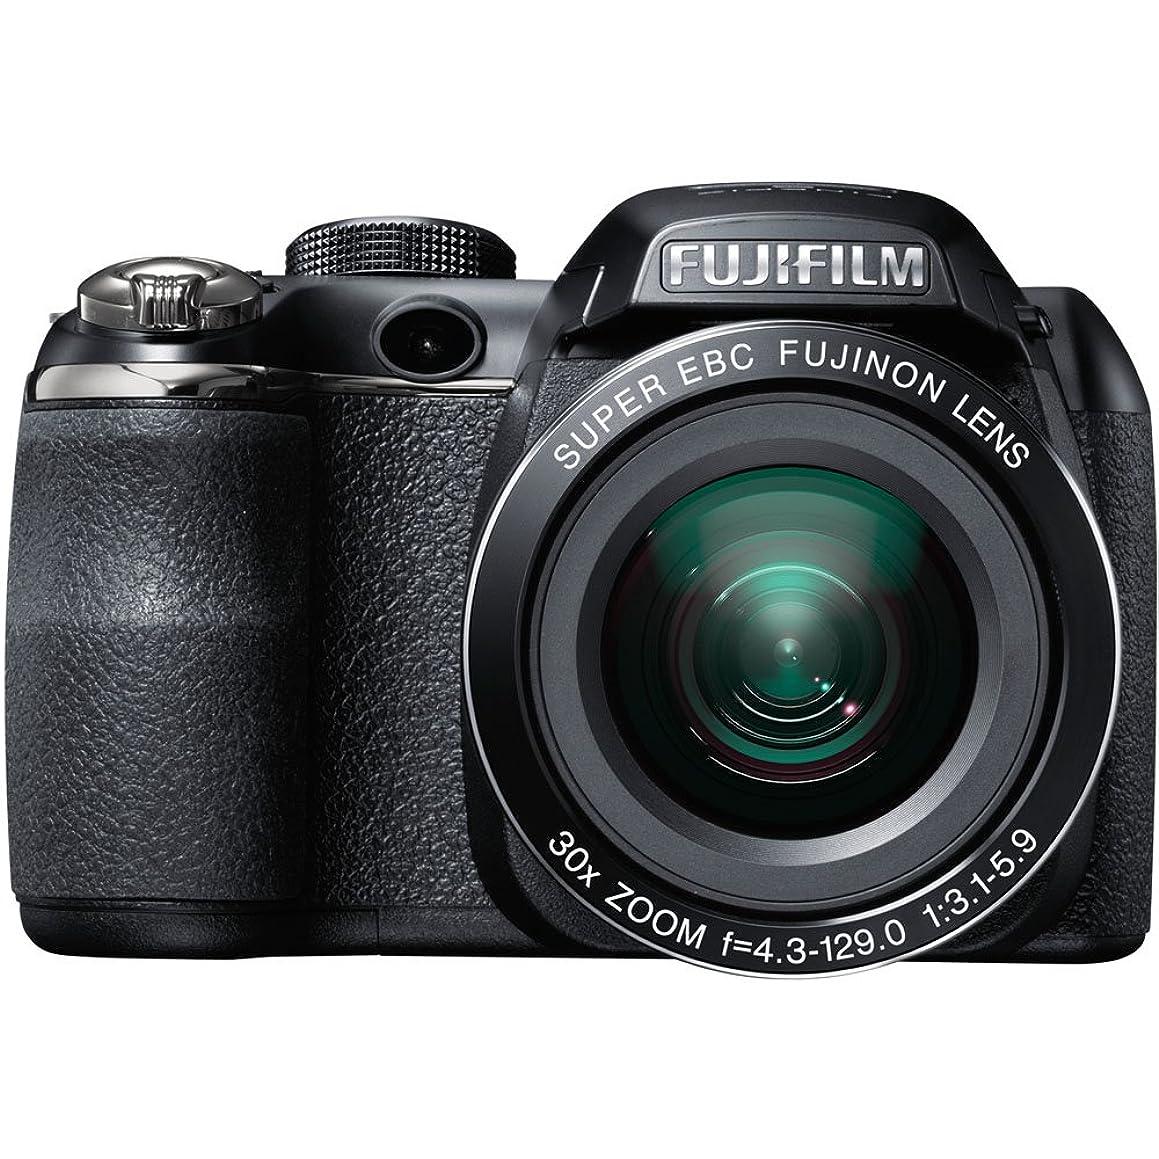 Fujifilm S4500 Compact Digital Camera